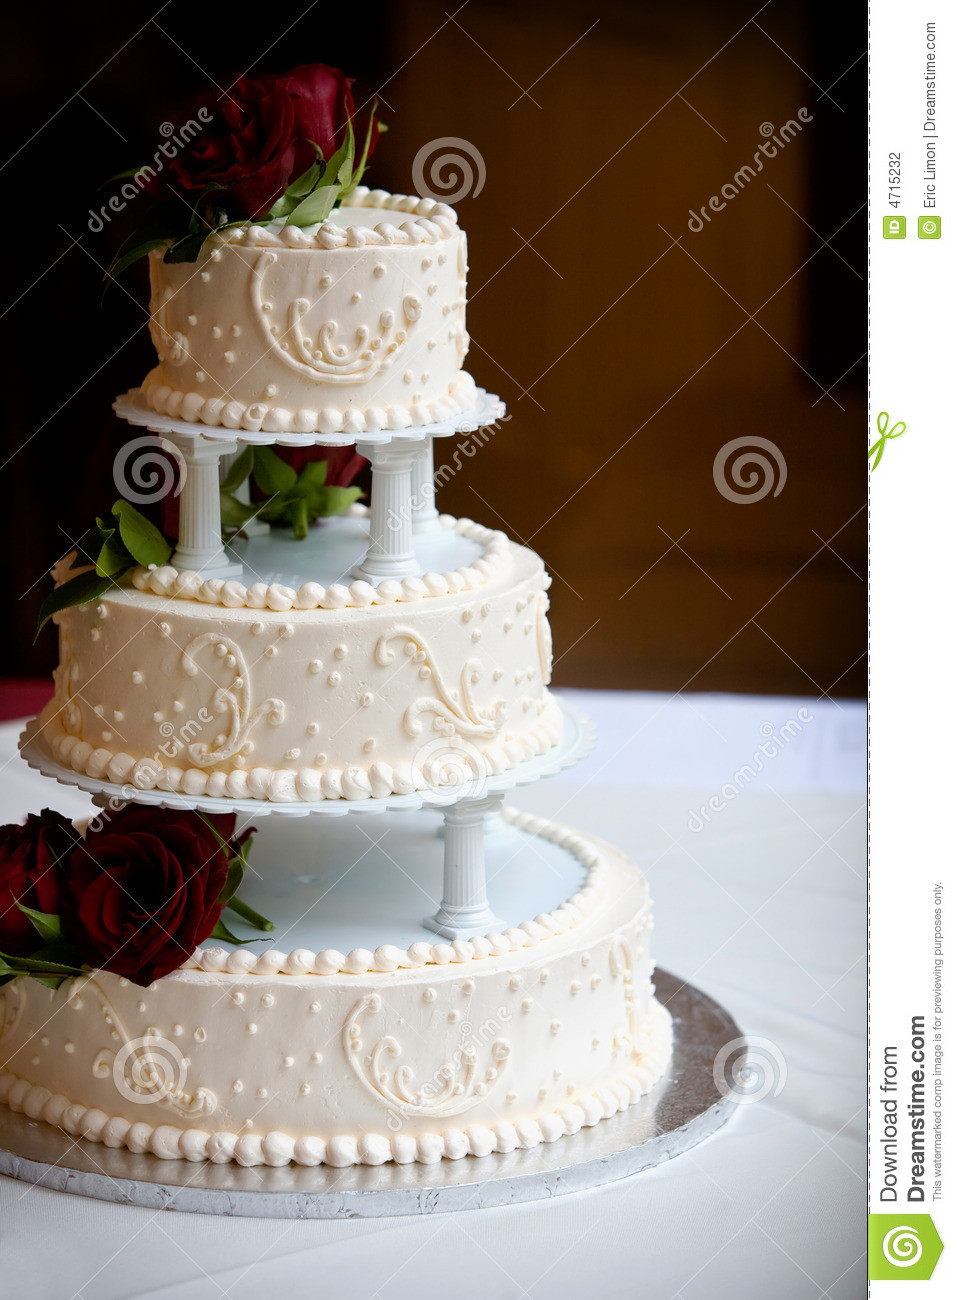 Wedding Cakes Tier  Wedding Cake With Three Tiers Stock Image of